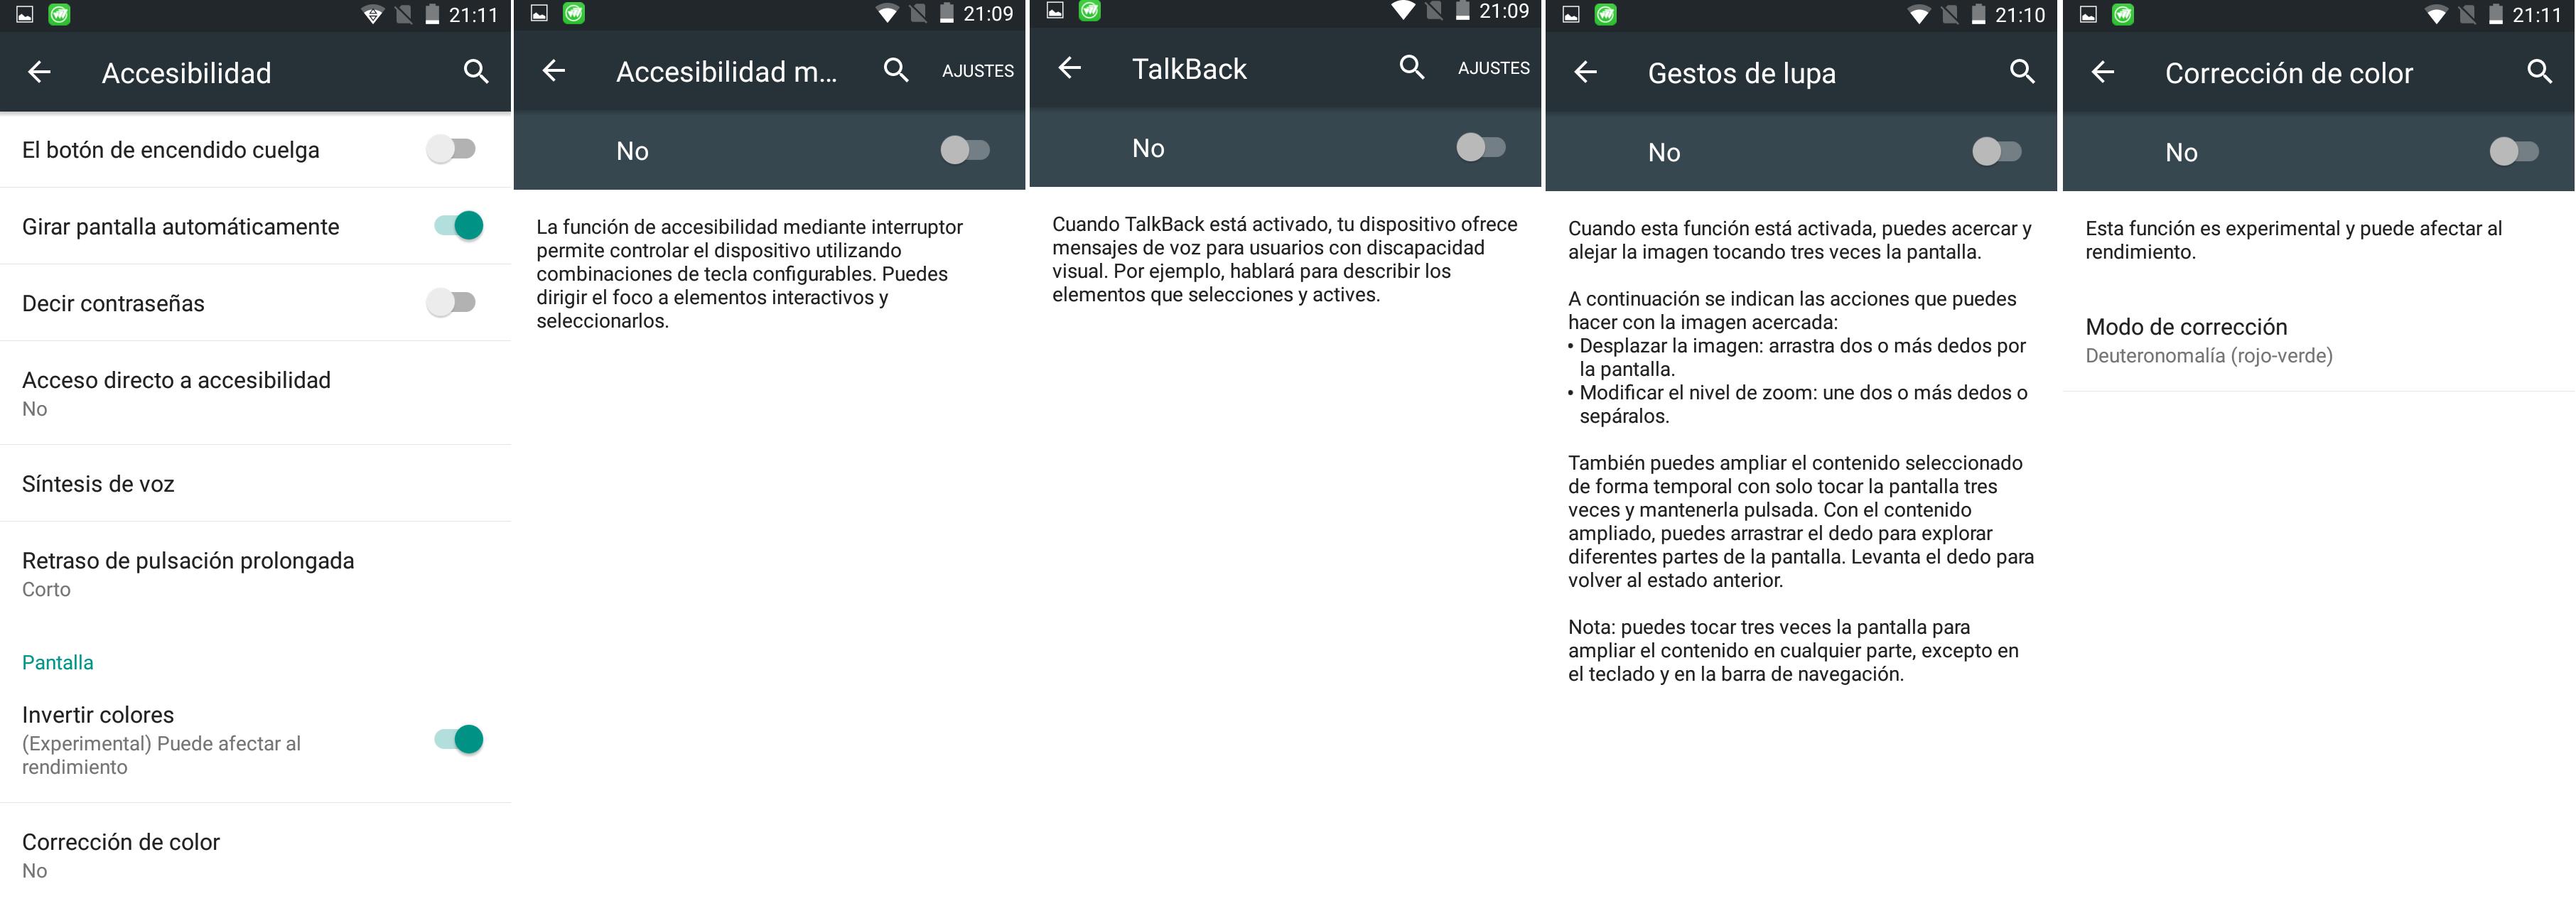 gizlogic-ulefone-paris-accesibilidad-15